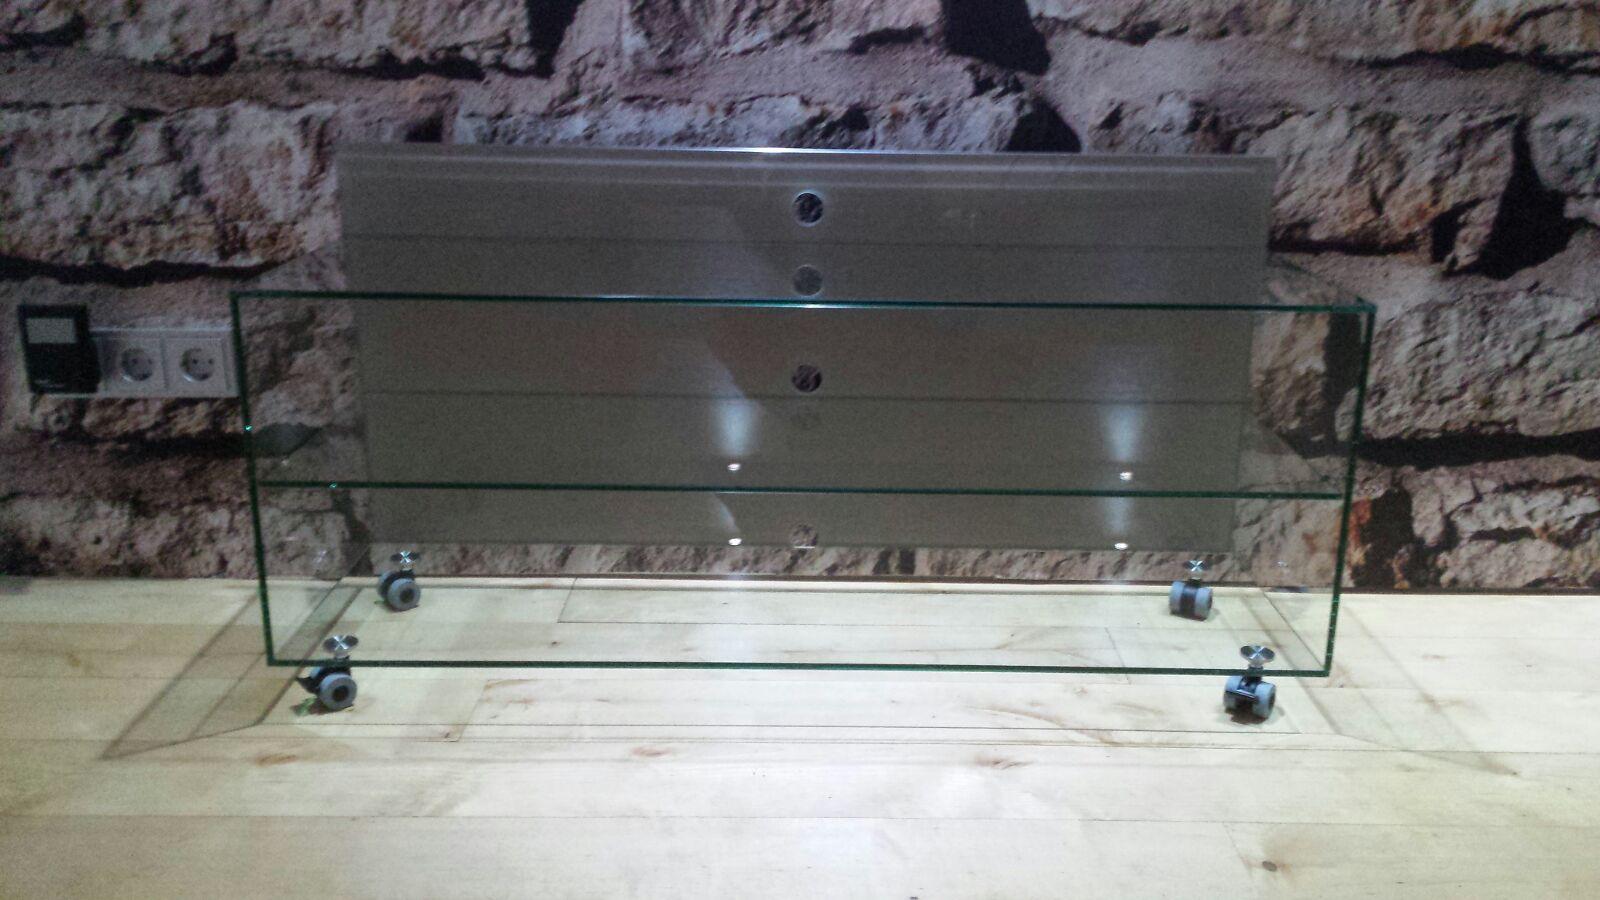 Hifimöbel aus Glas